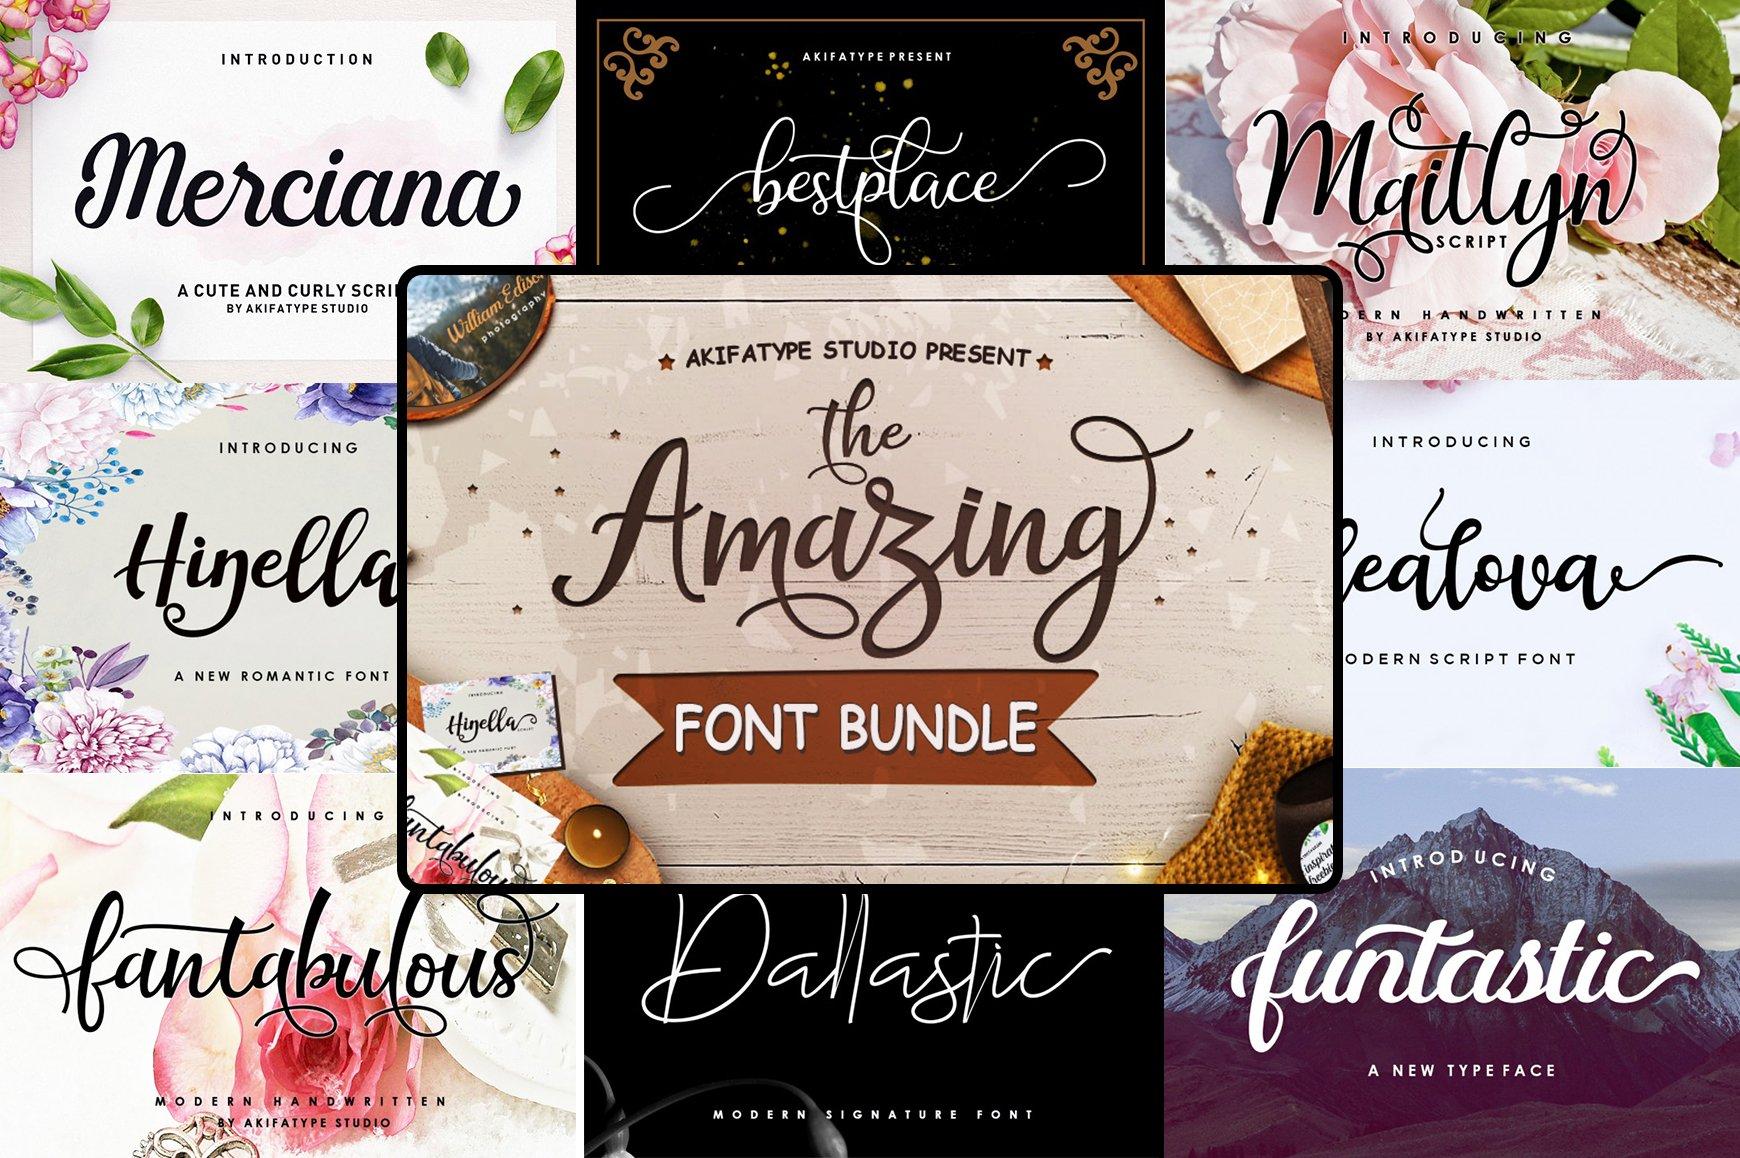 The Amazing Font Bundle - 8 Typefaces $8 only - 001